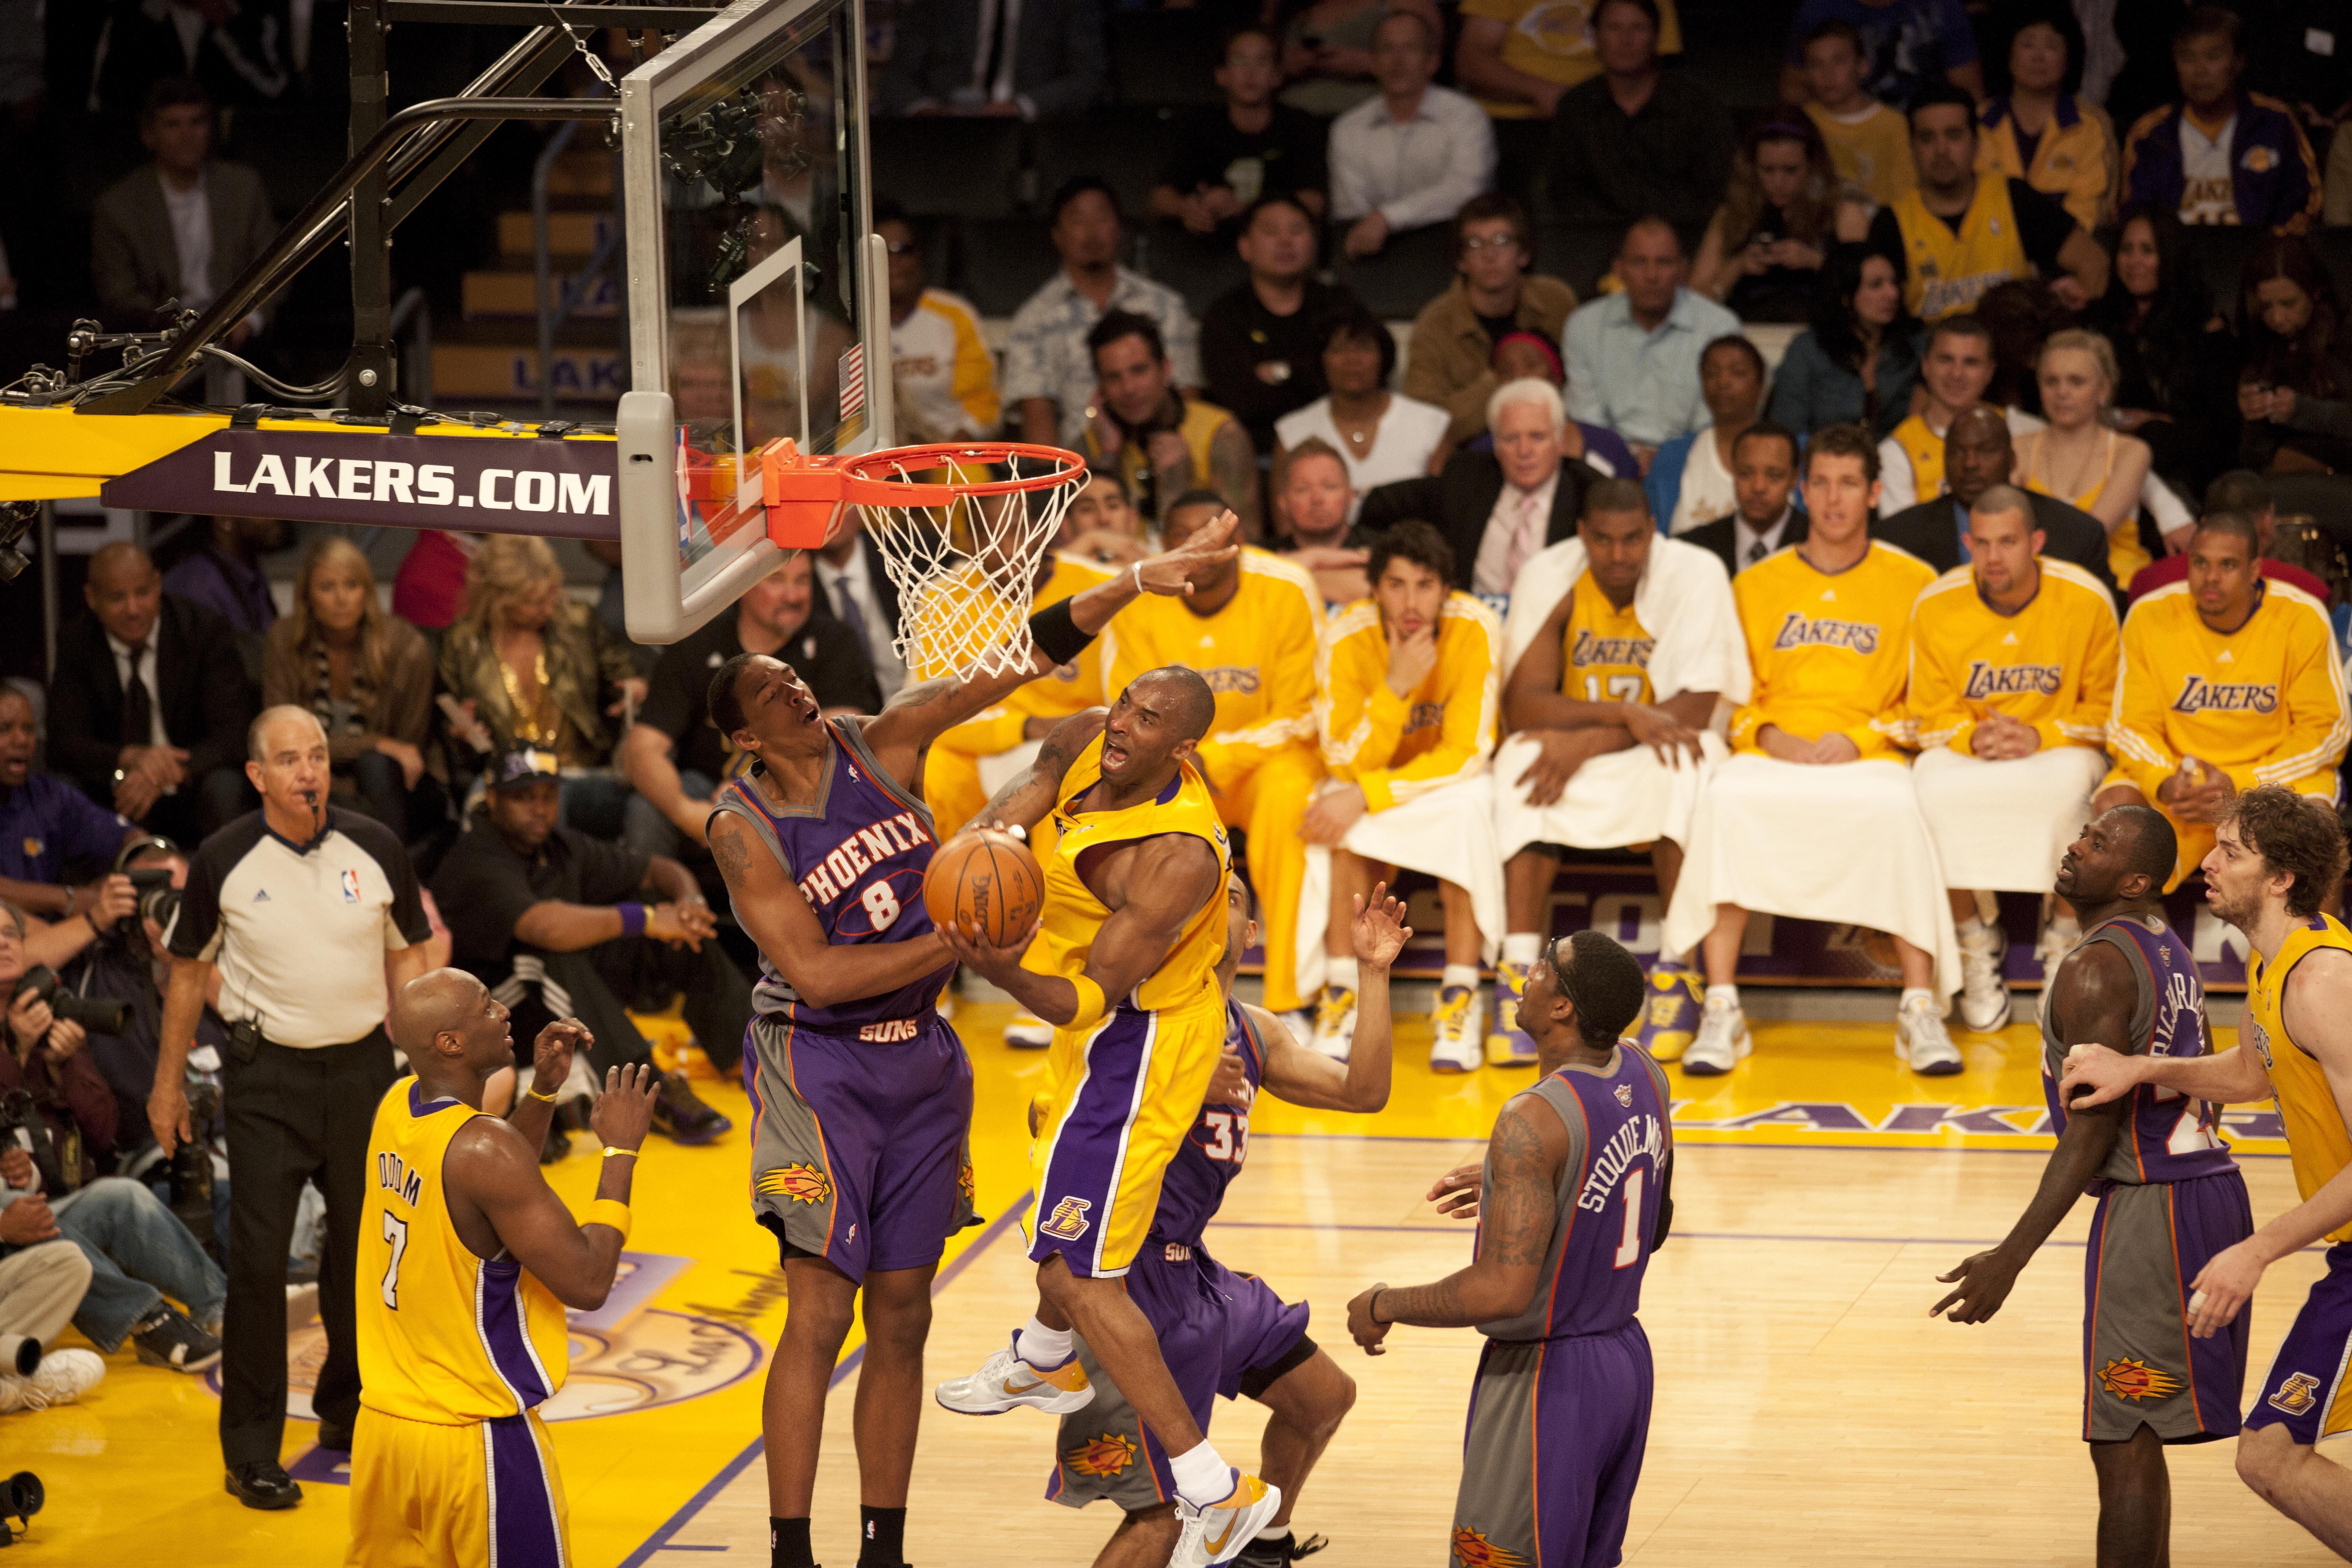 Nba Basketball Los Angeles Lakers: LOS ANGELES LAKERS Nba Basketball (64) Wallpaper